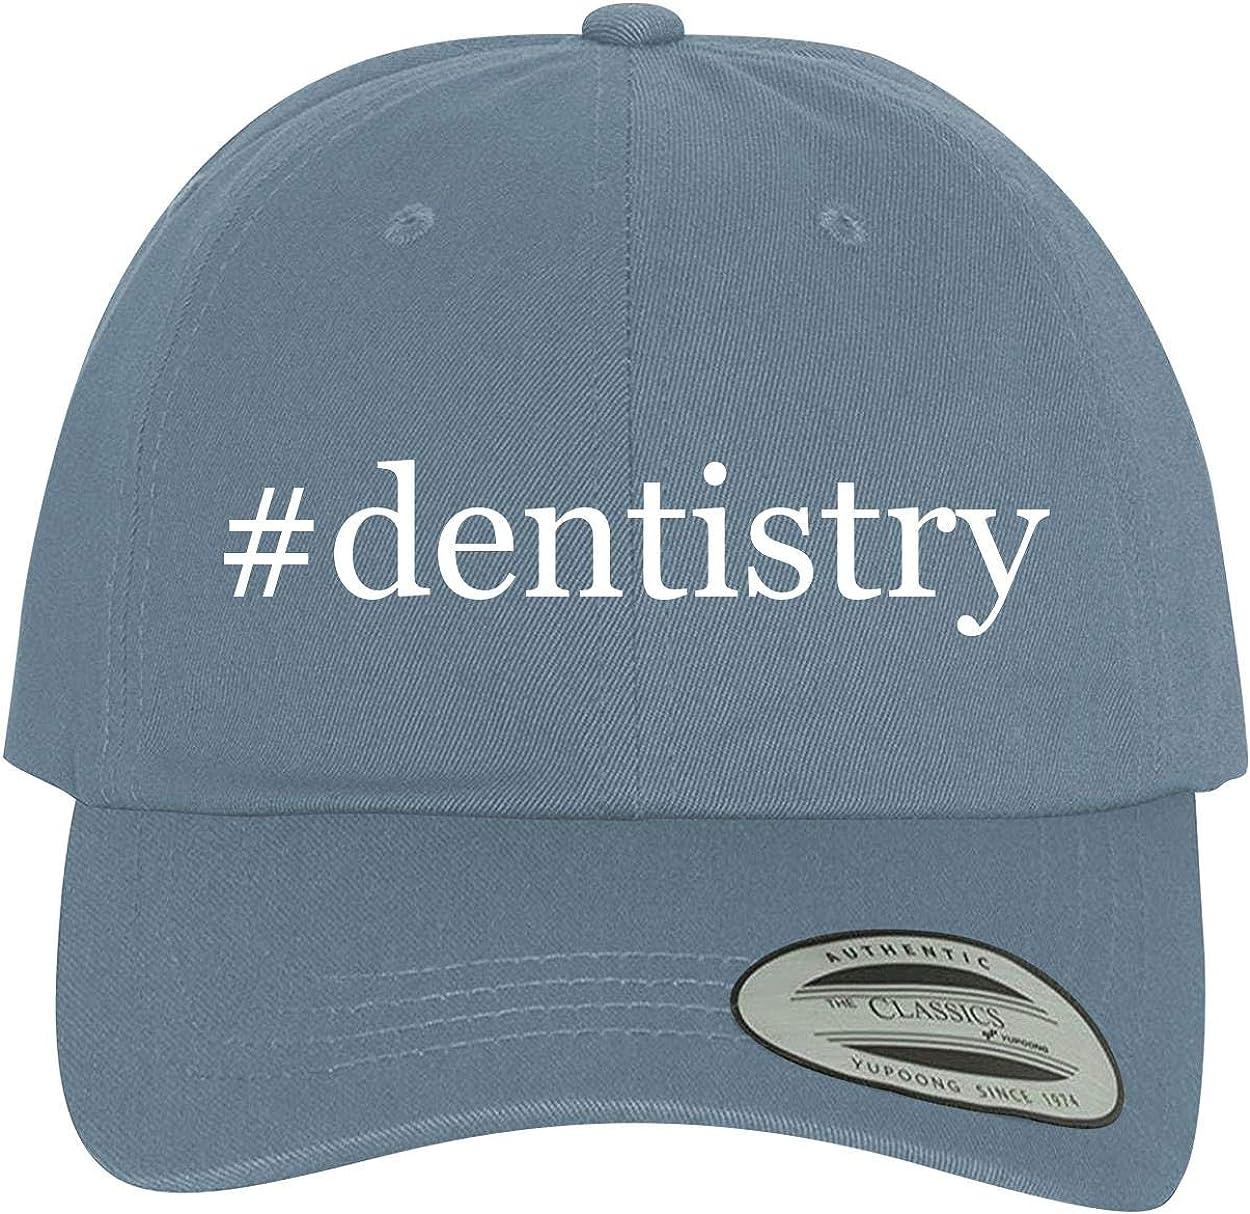 Comfortable Dad Hat Baseball Cap BH Cool Designs #Dentistry